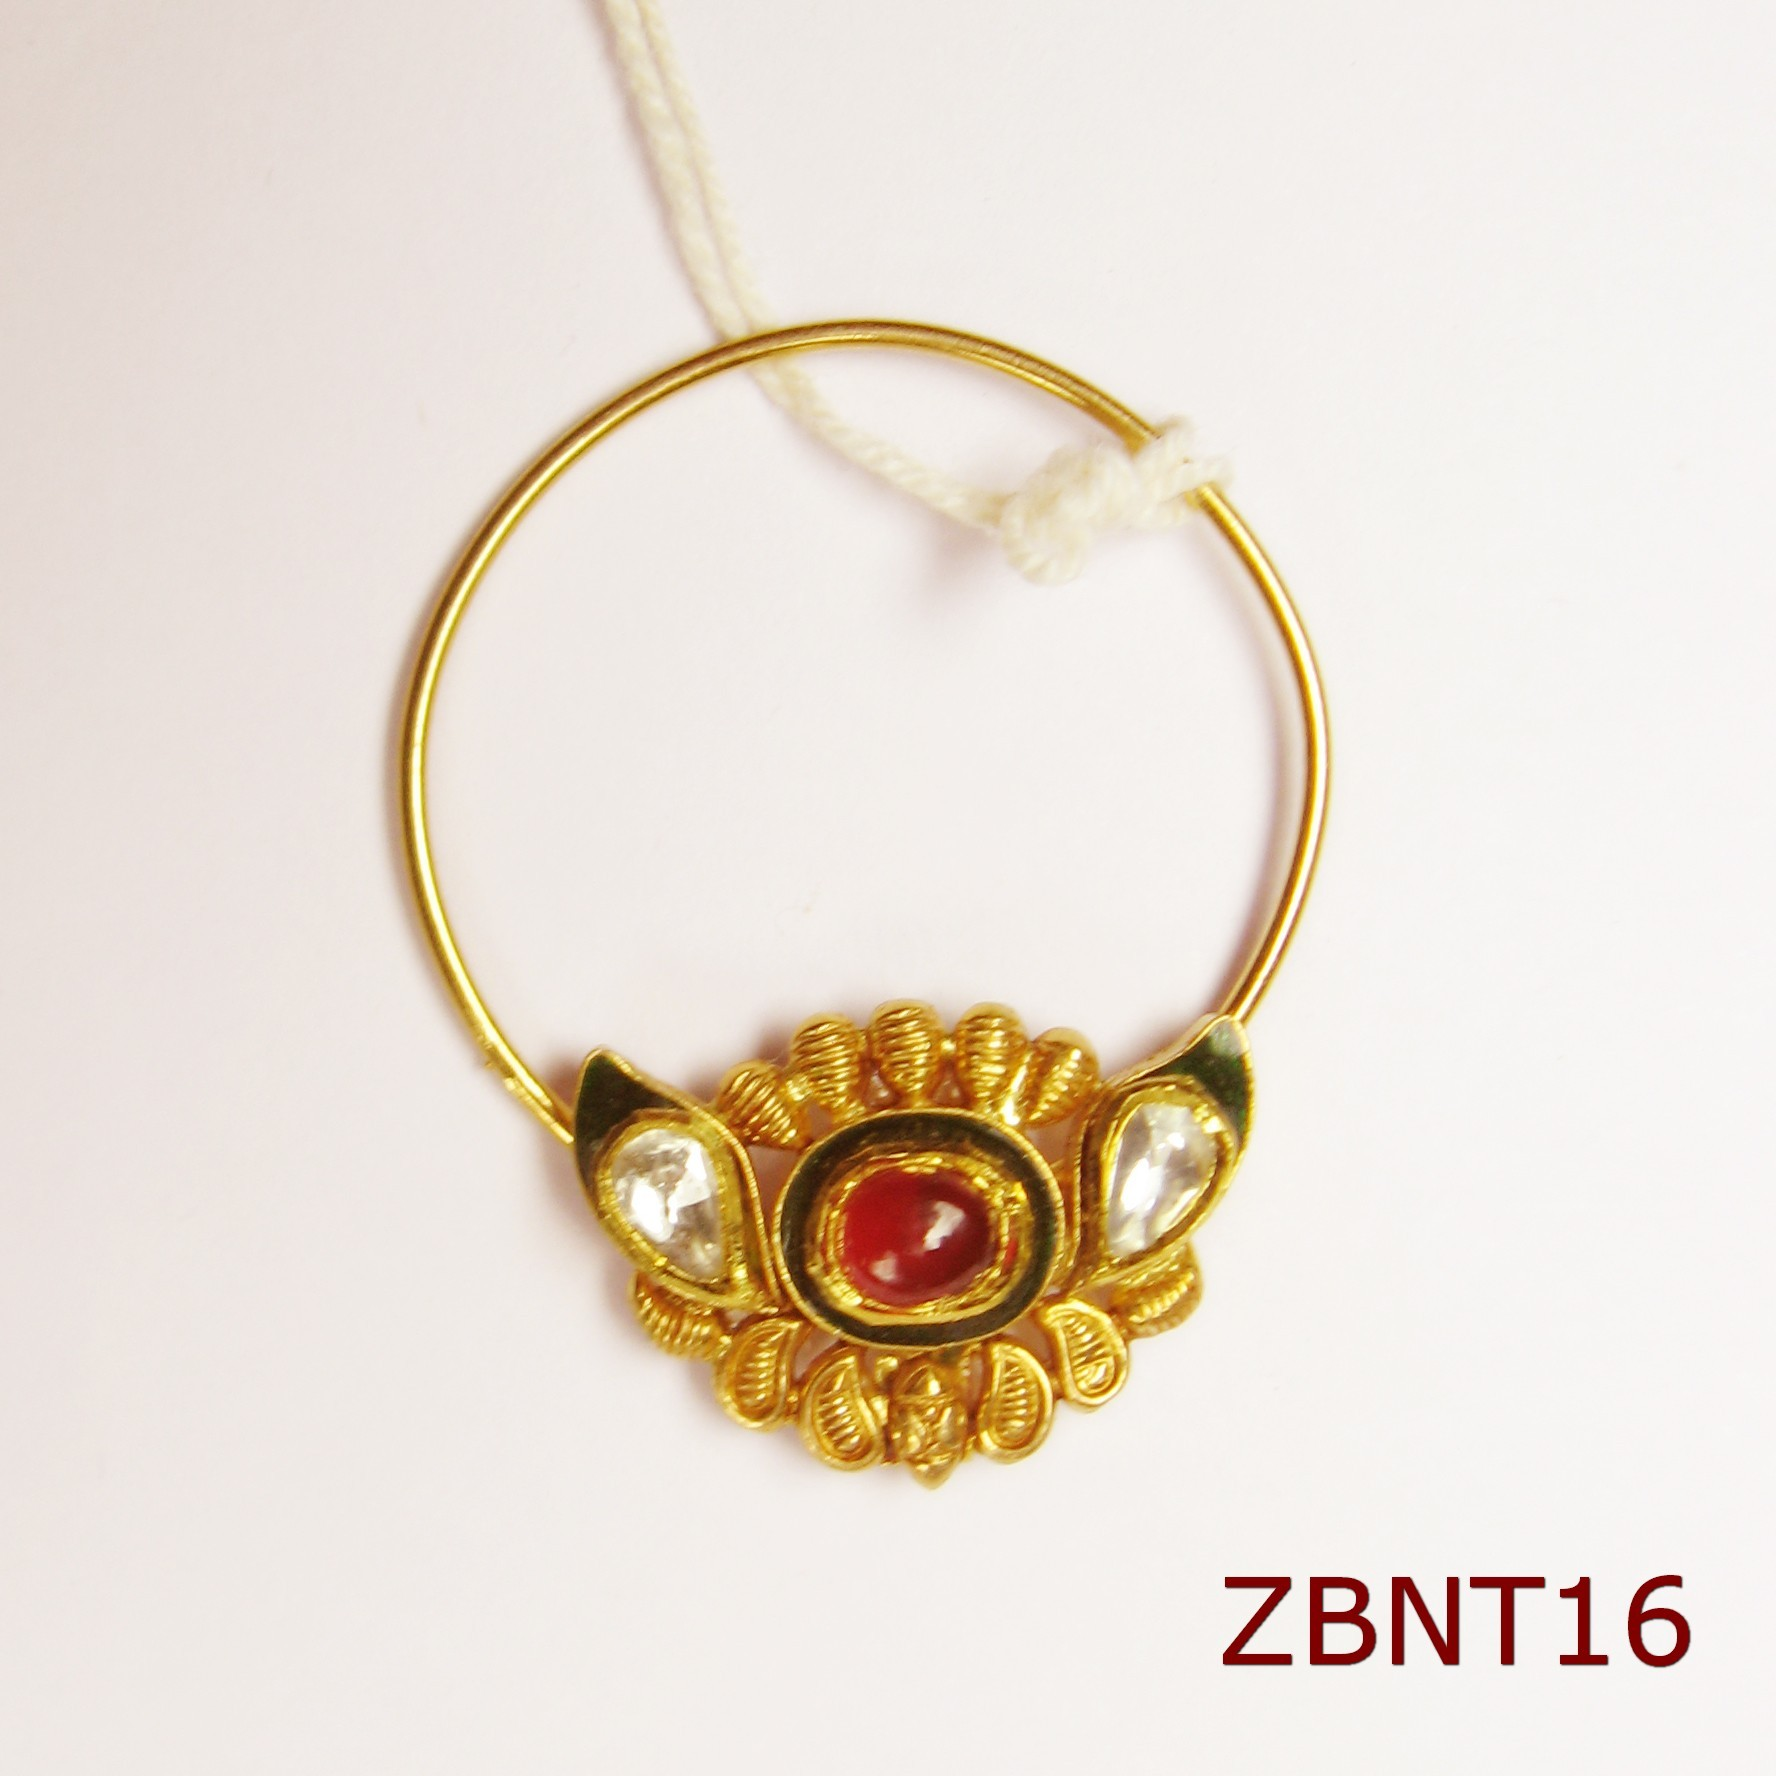 ZBNT16